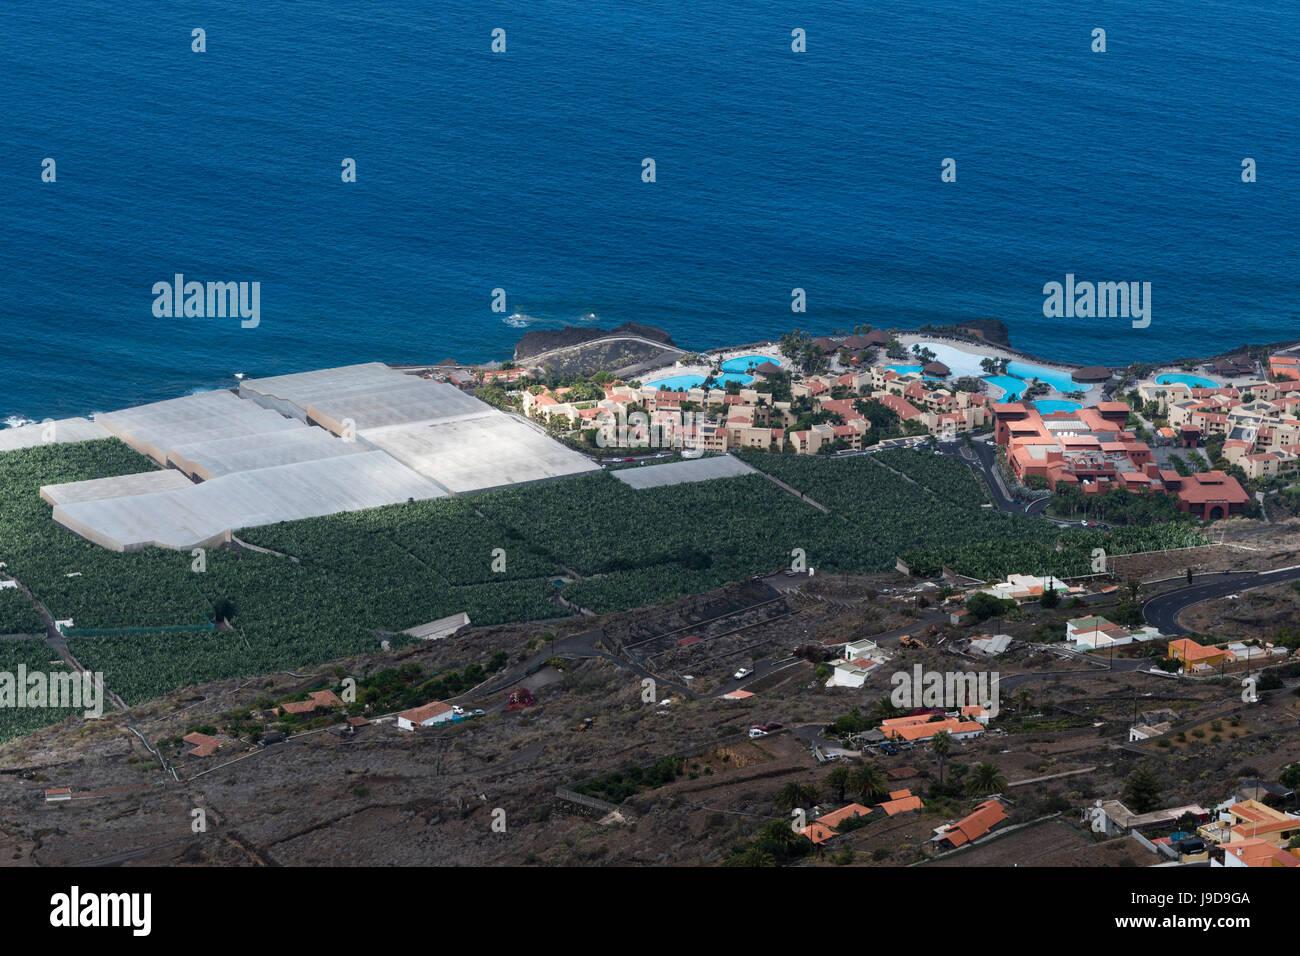 Banana plantations, El Remo, La Palma Island, Canary Islands, Spain, Atlantic, Europe - Stock Image